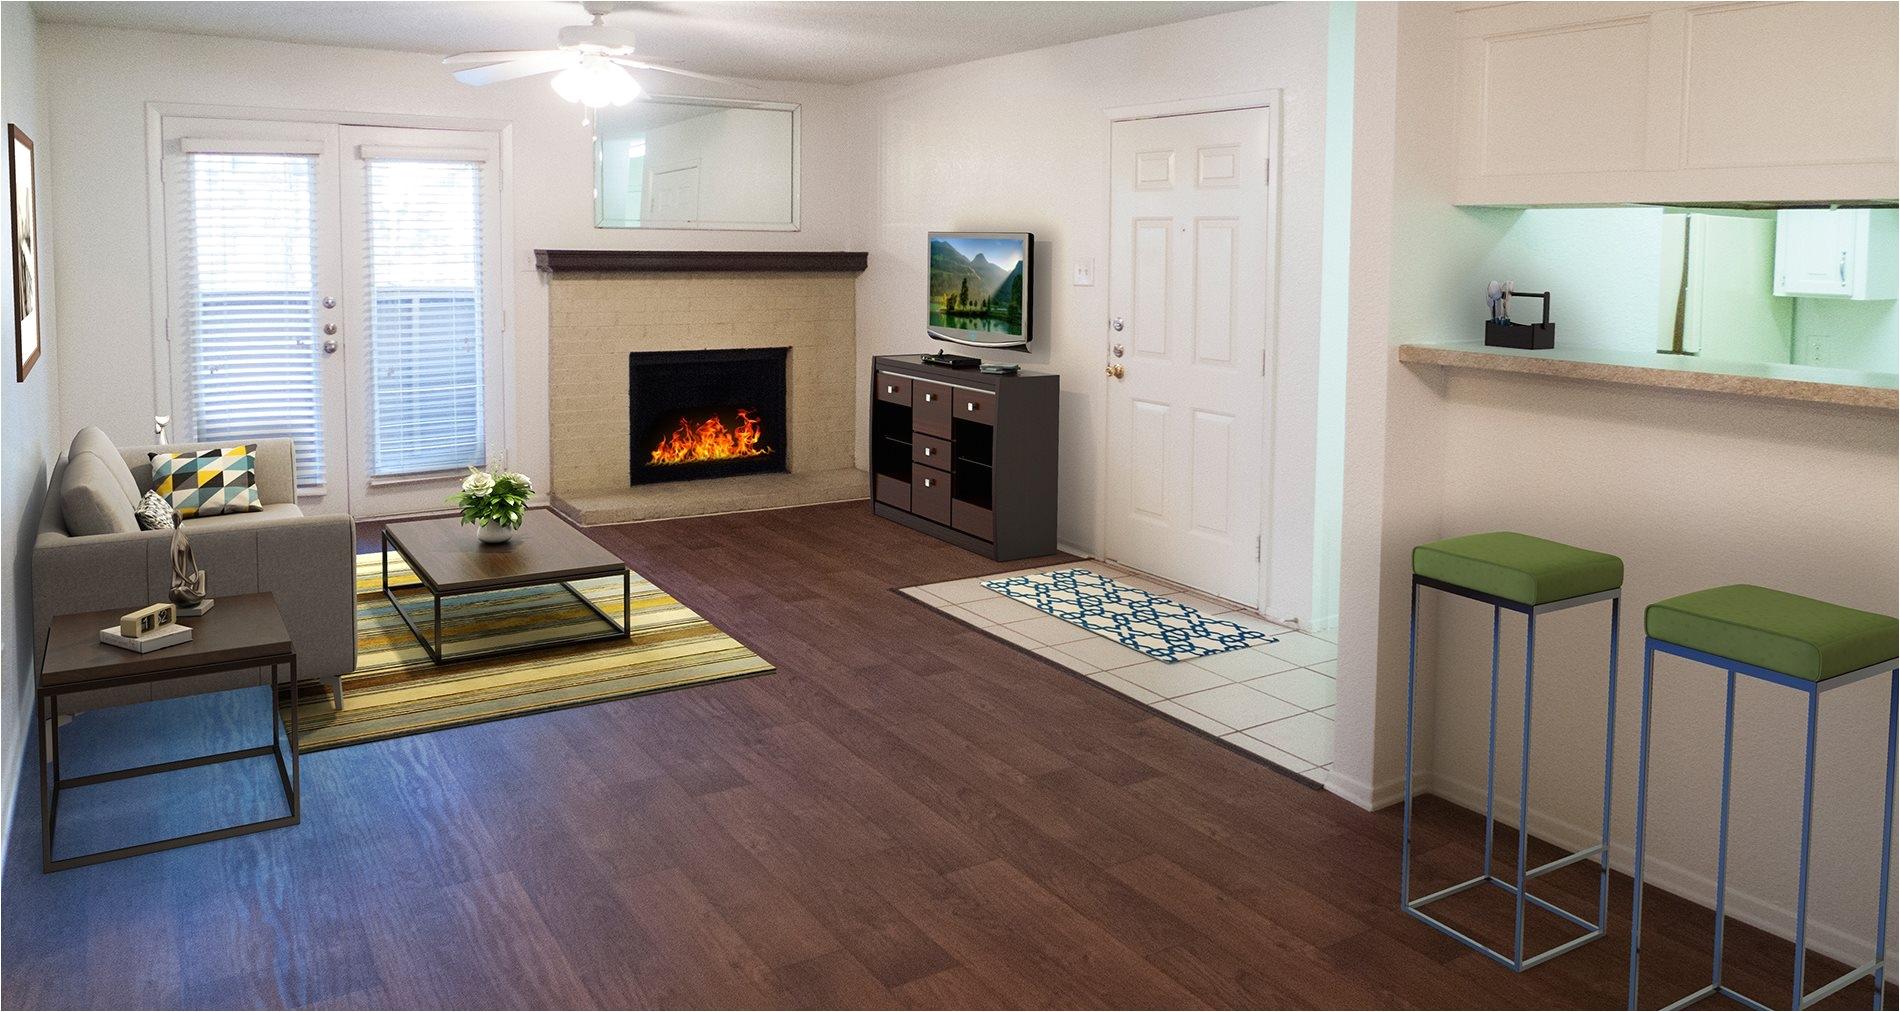 living room model background at ridgecrest apartments in denton texas tx